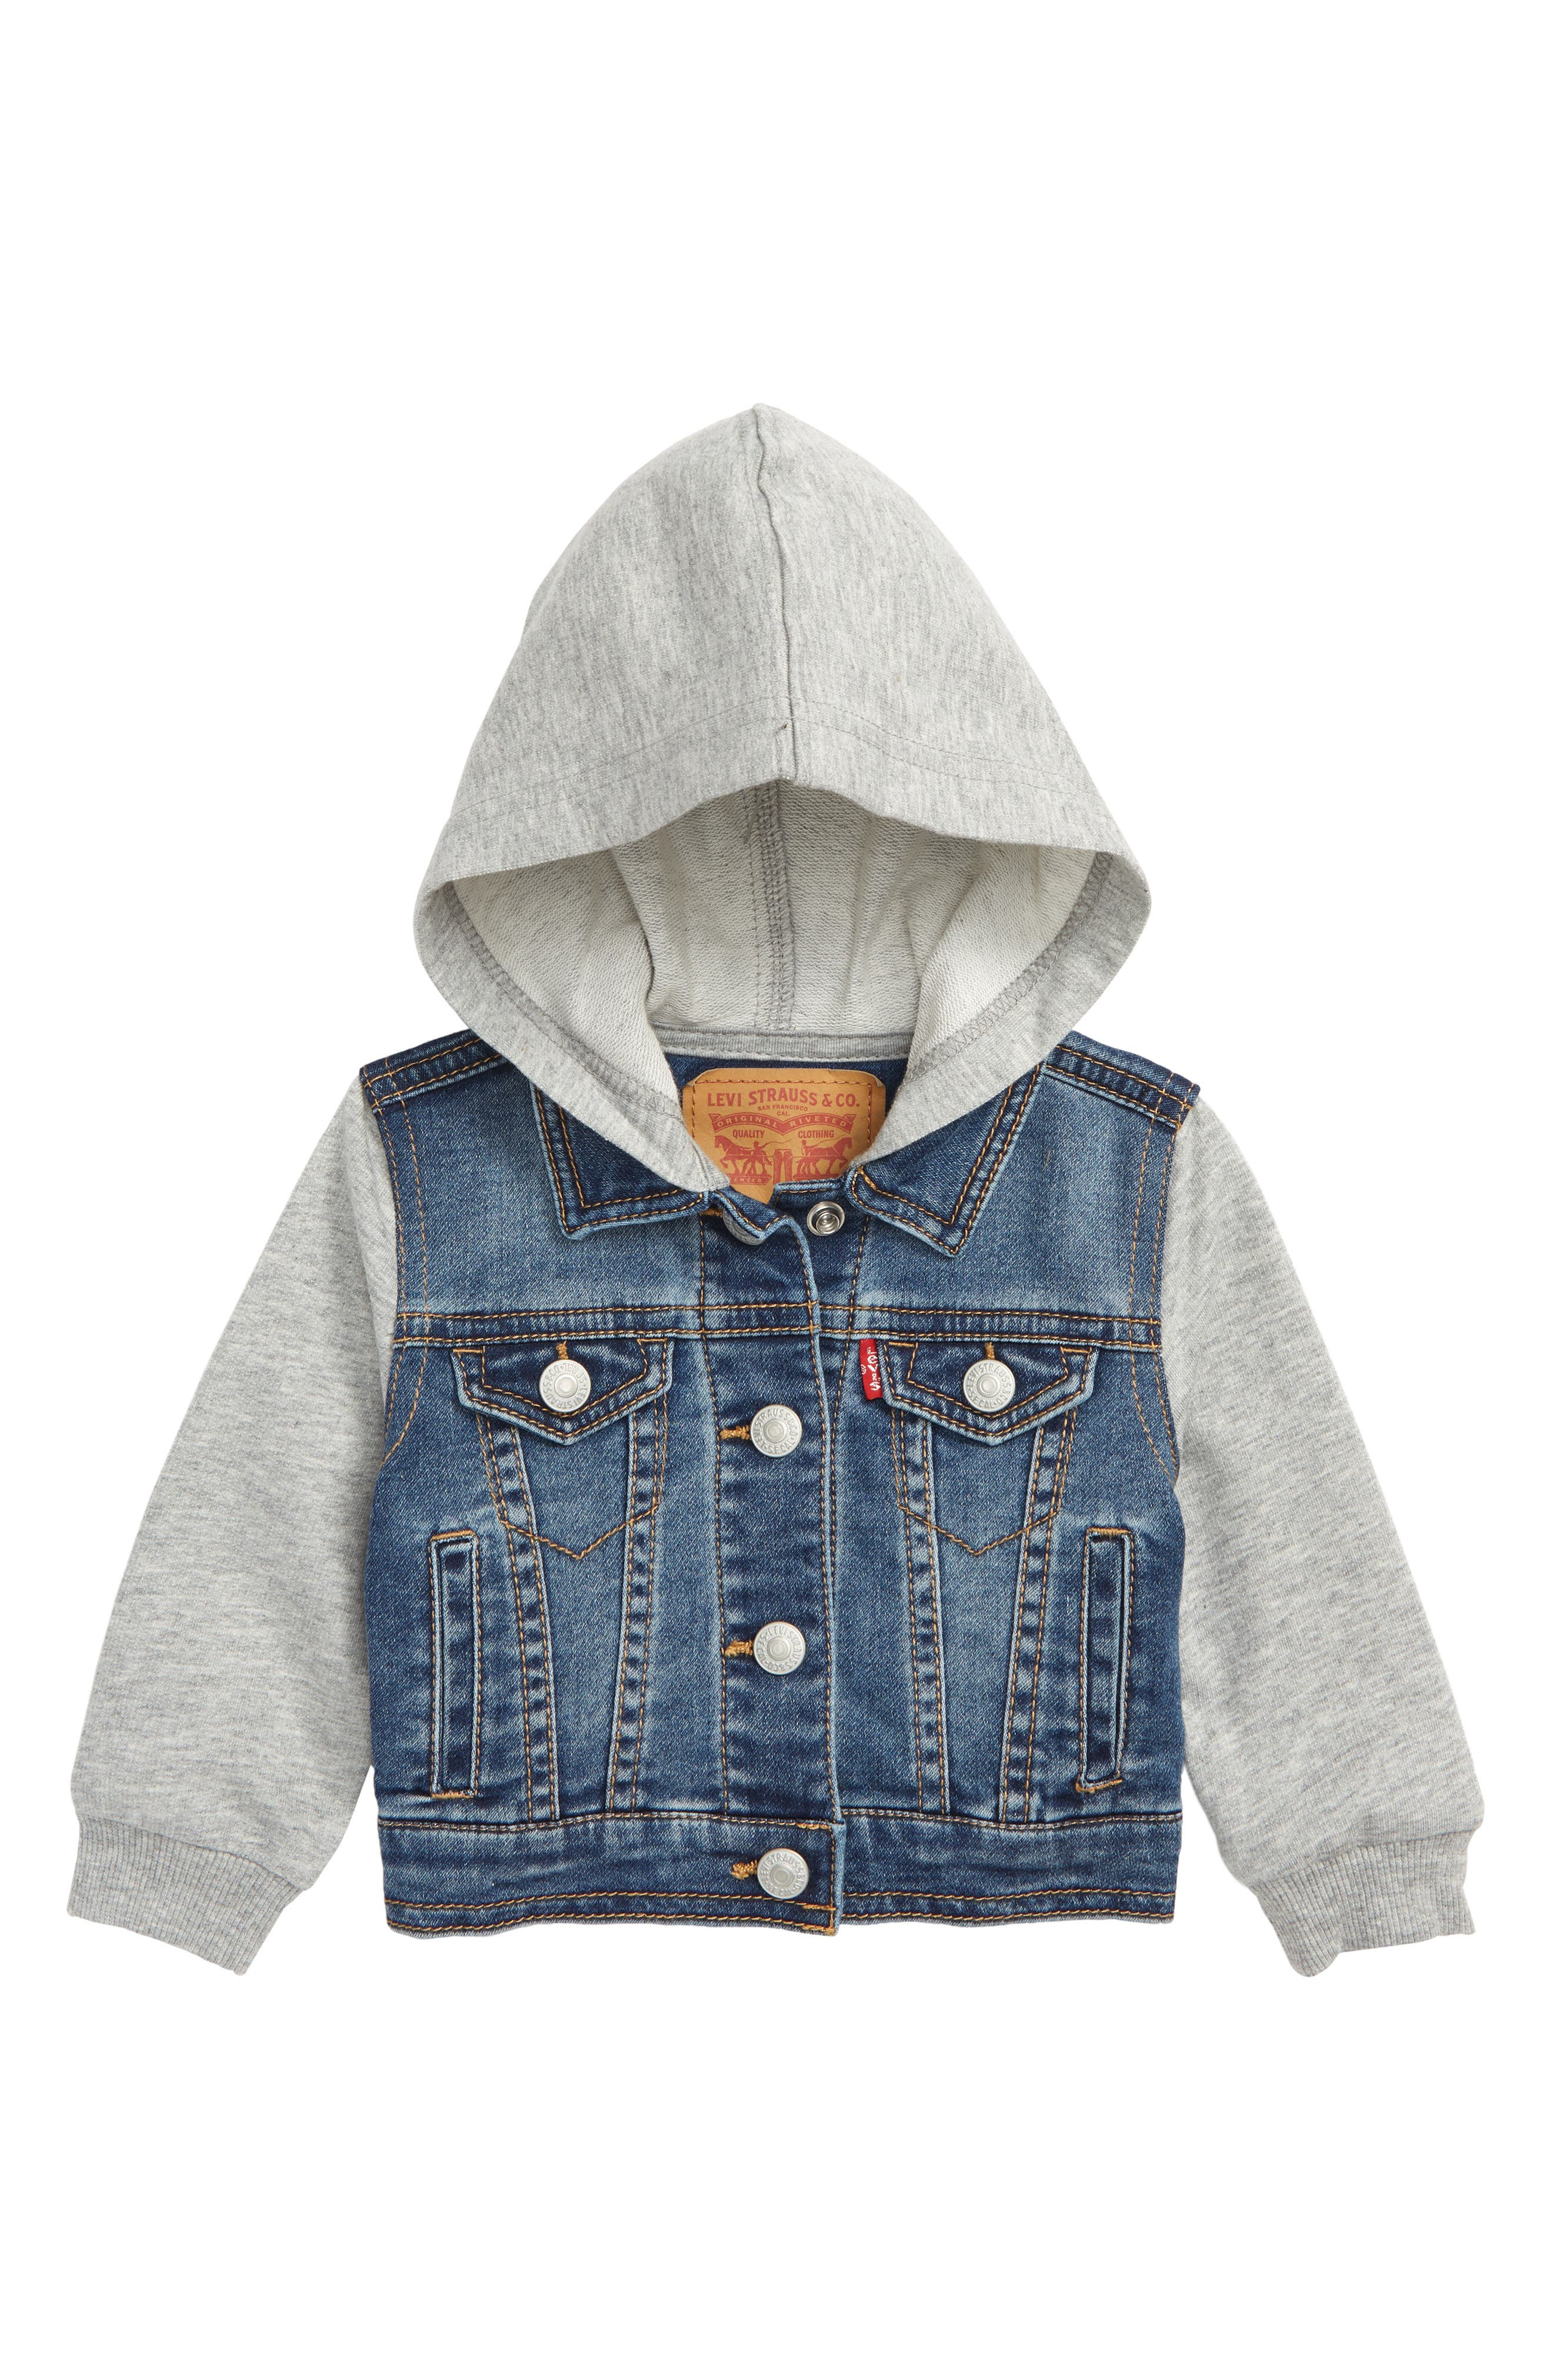 Levi's<sup>®</sup> Indigo Hooded Trucker Jacket,                         Main,                         color, 452